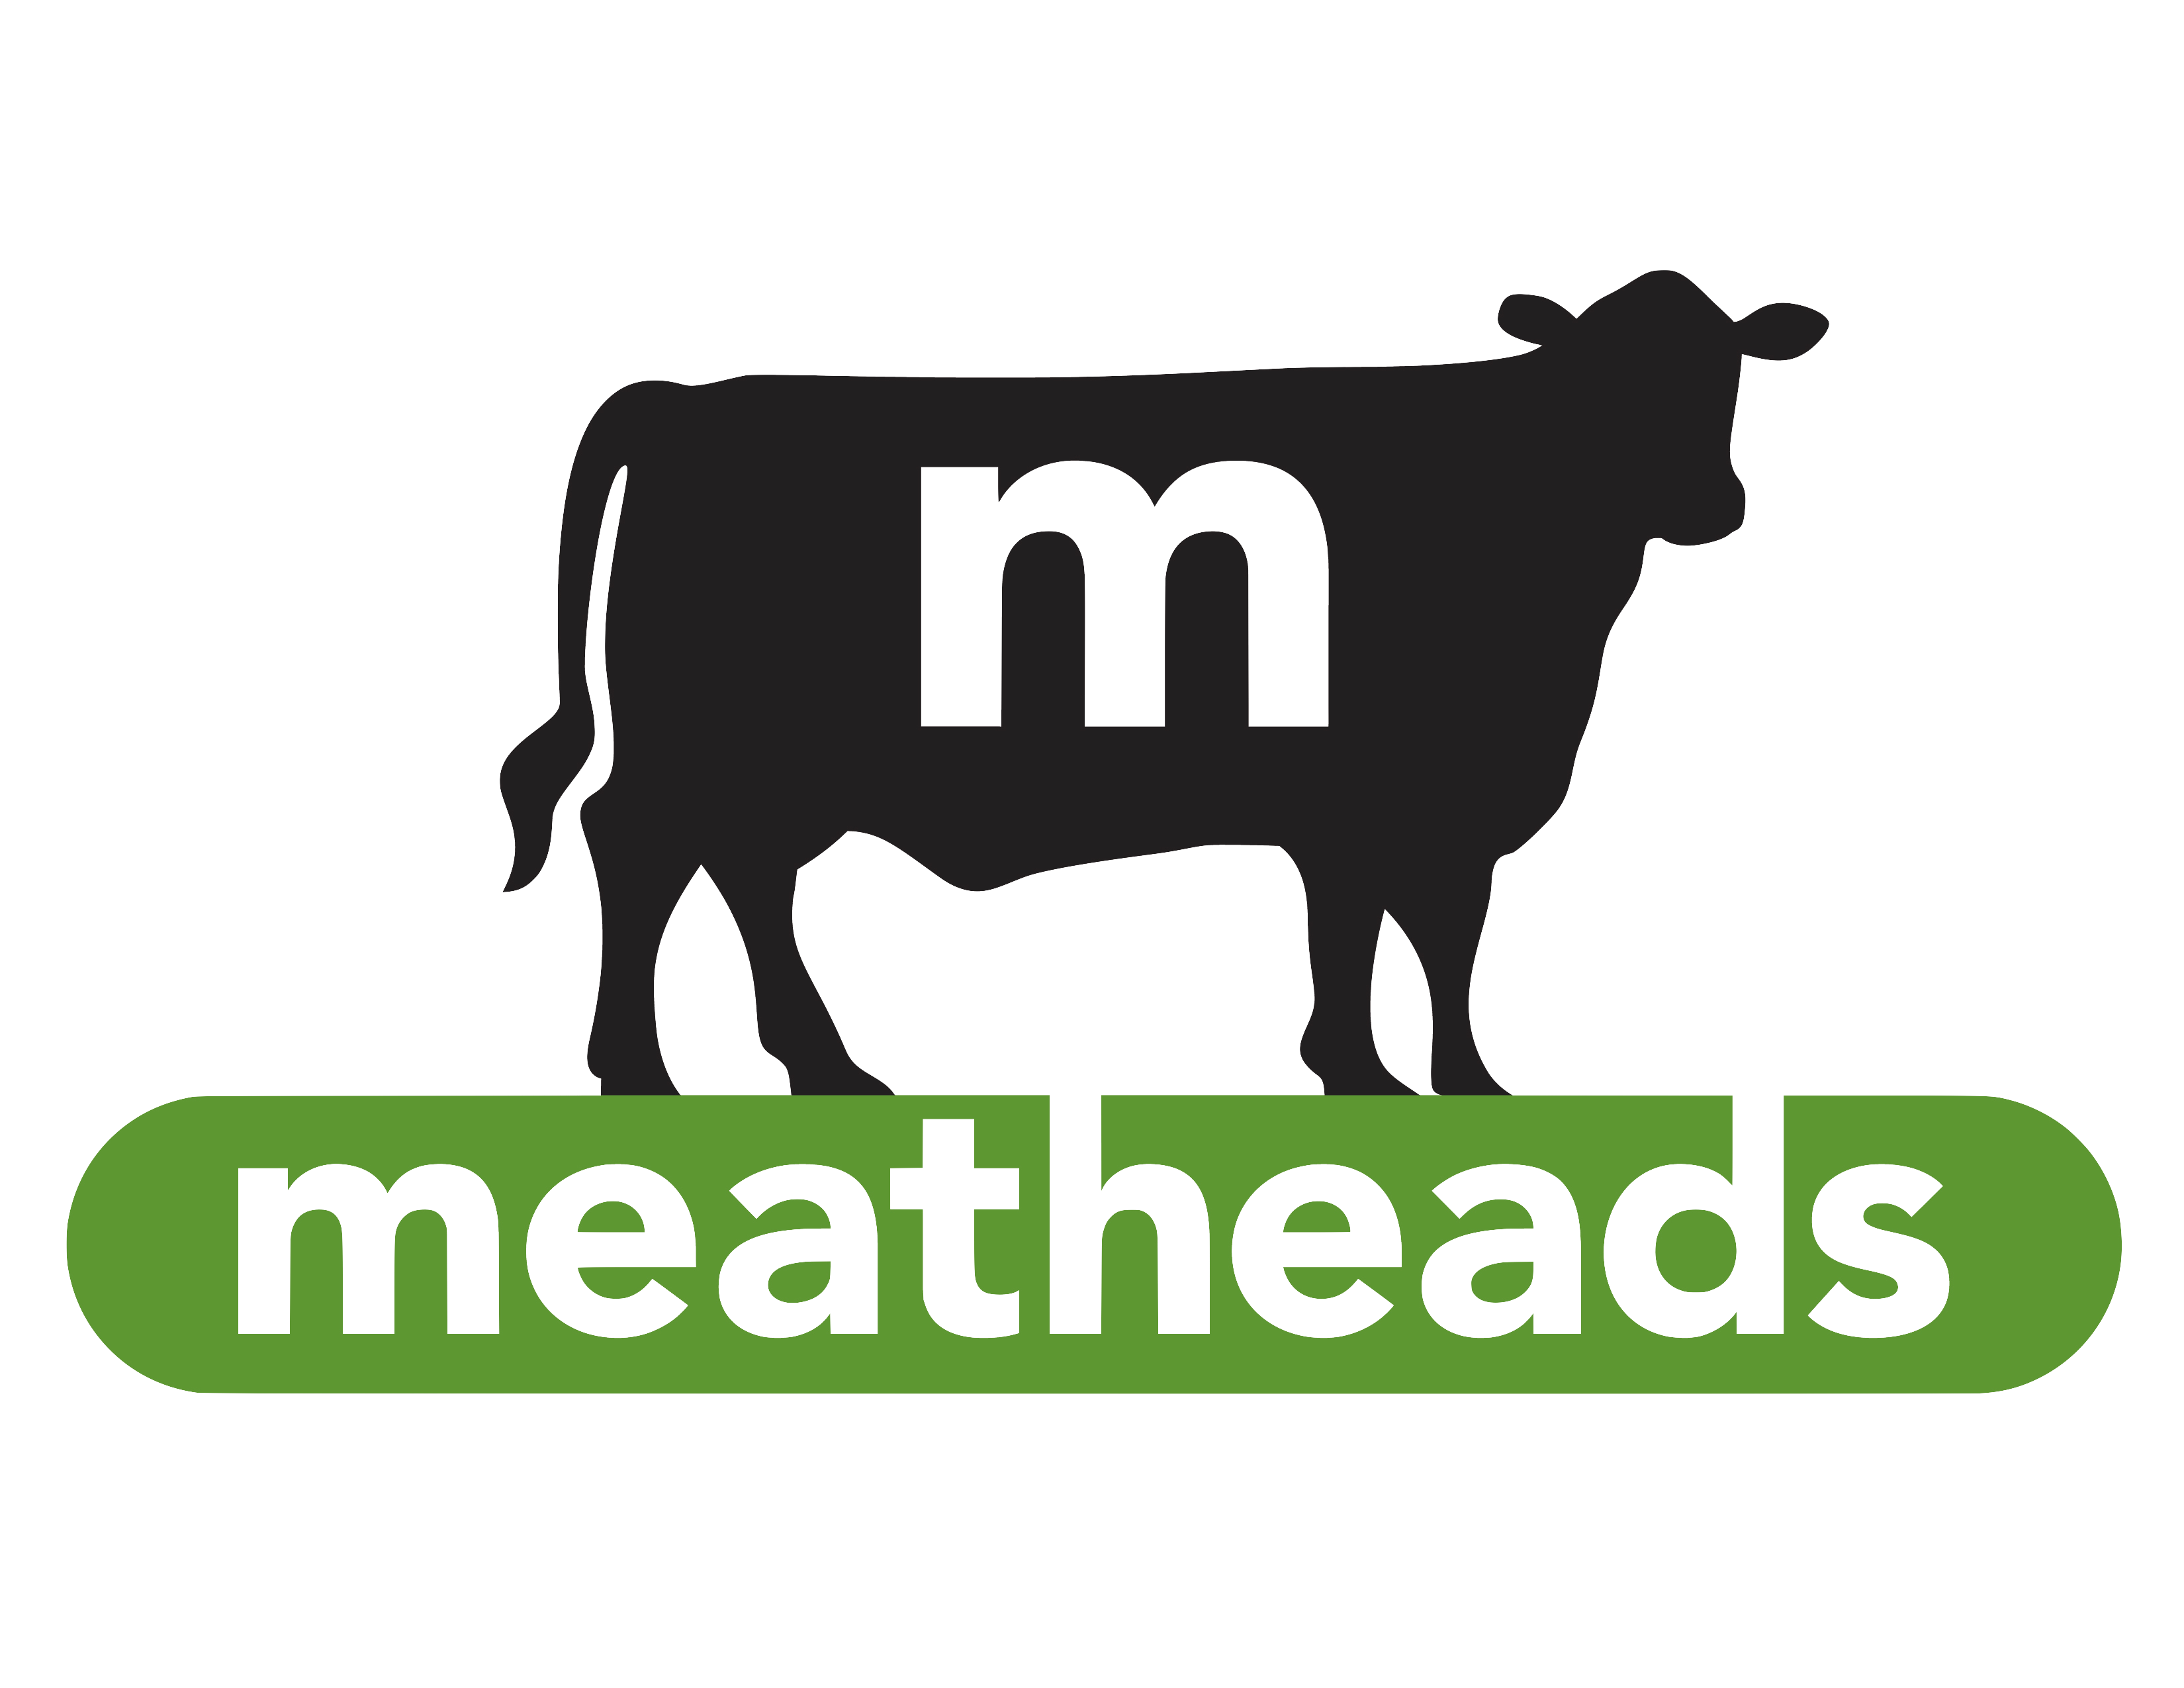 meatheads-green-logo